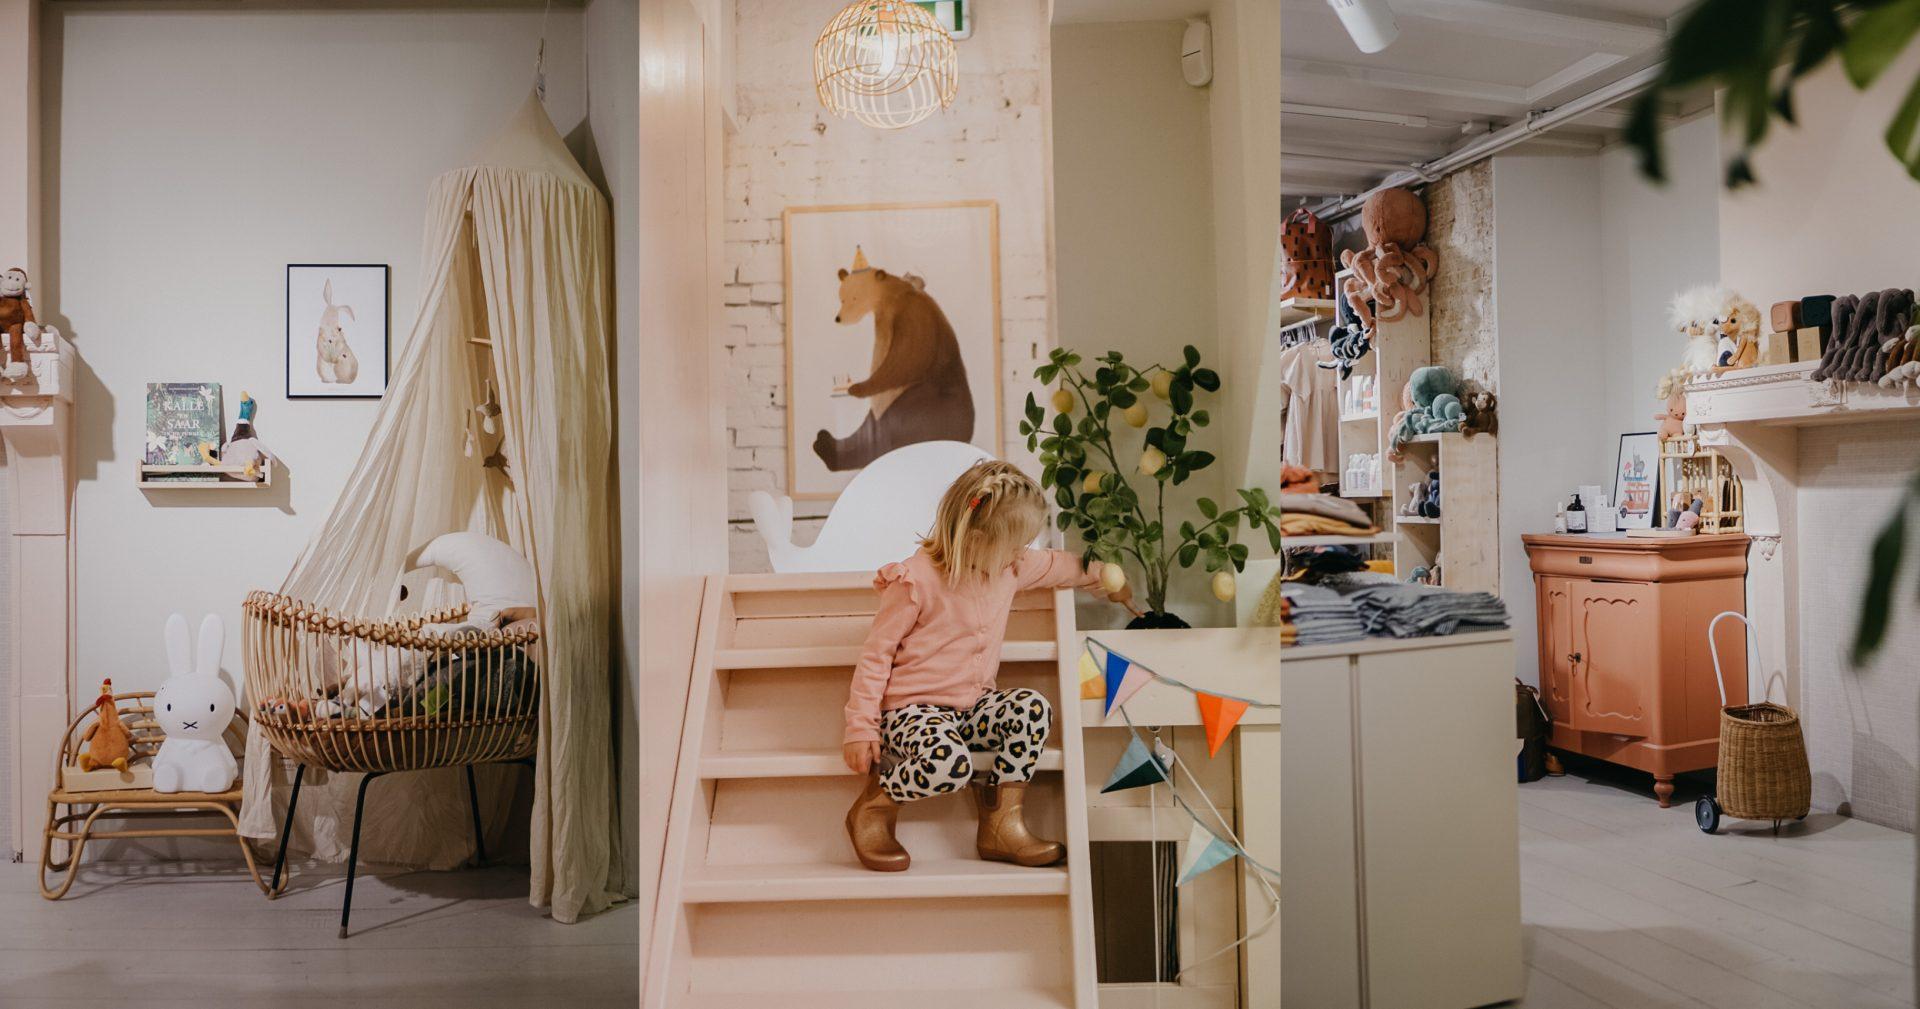 kindermodeblog musthaves kinderkledingwinkel vierseizoenen leeuwarden